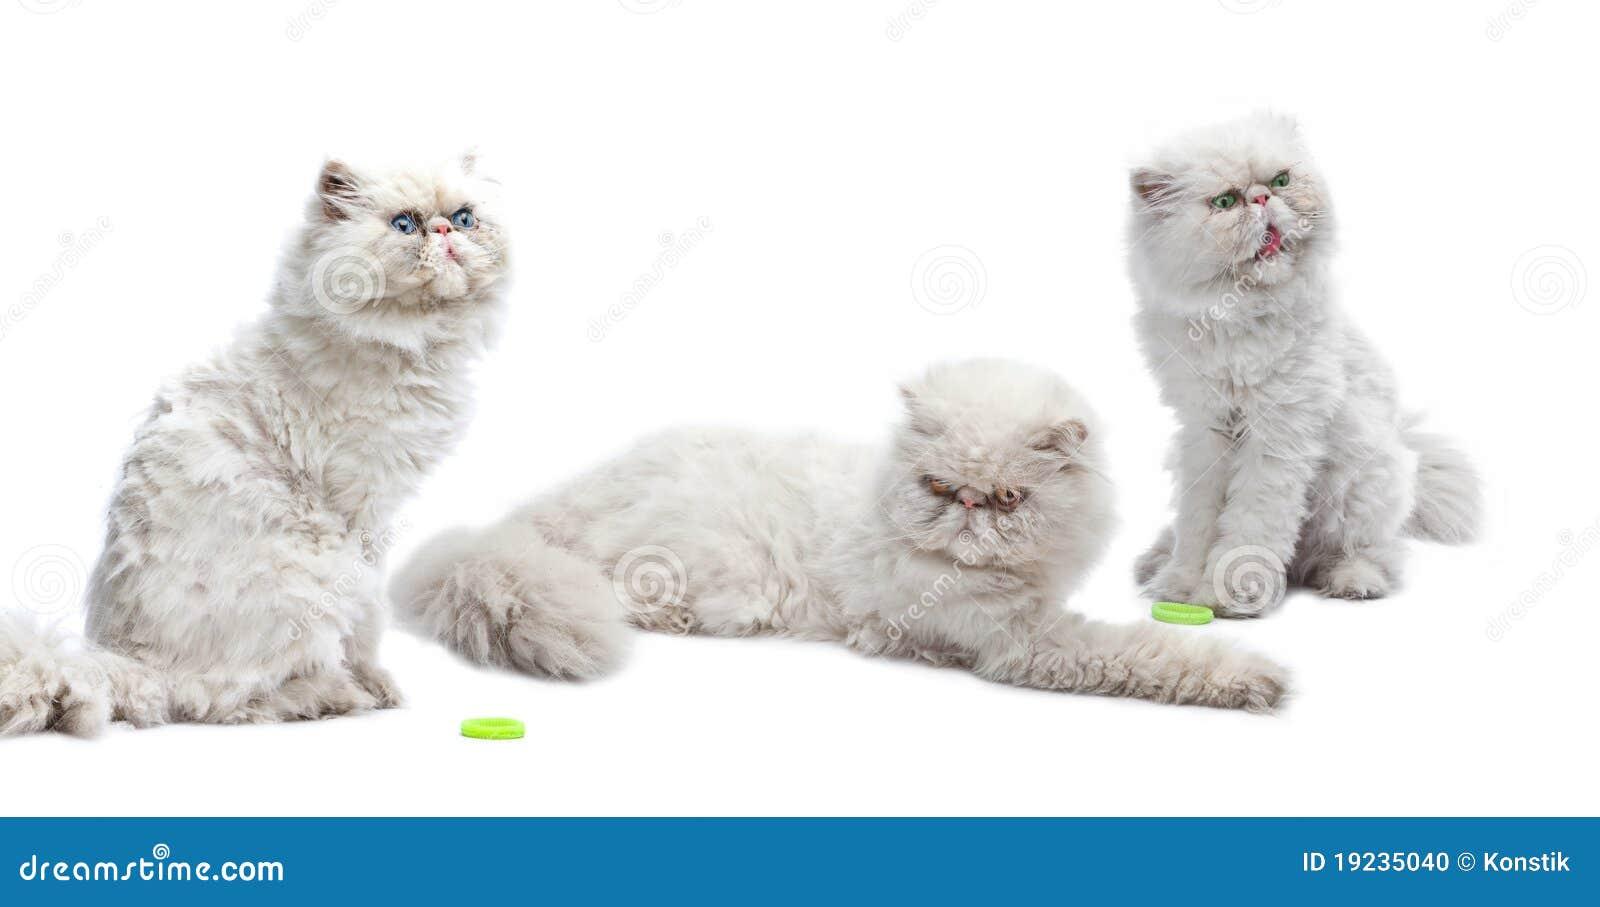 Three white Persian cats